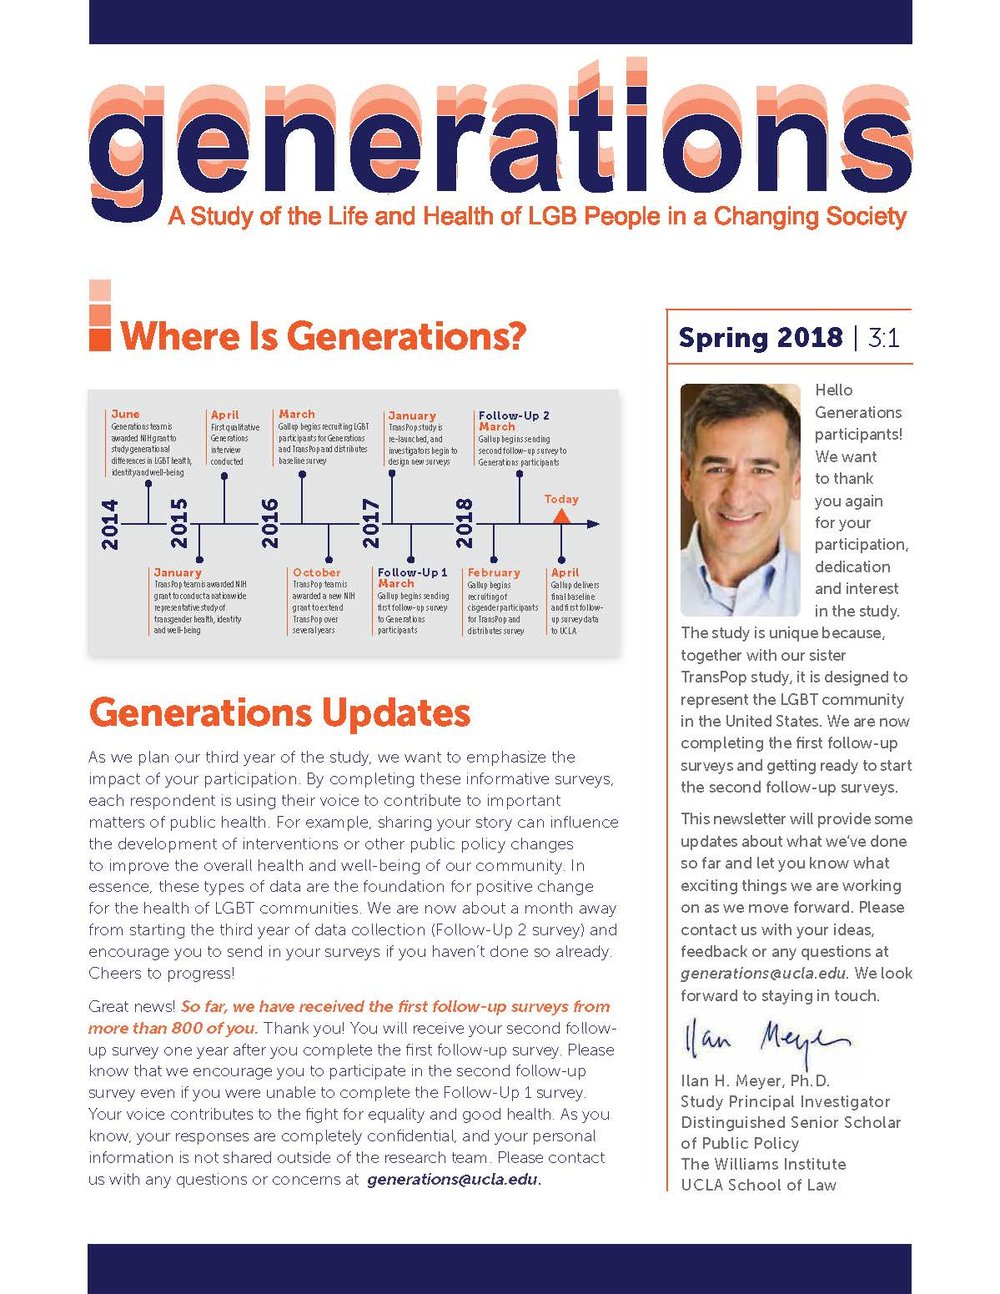 UCLAWI_GenerationsNewsletter_Spring2018_4_Page_1.jpg